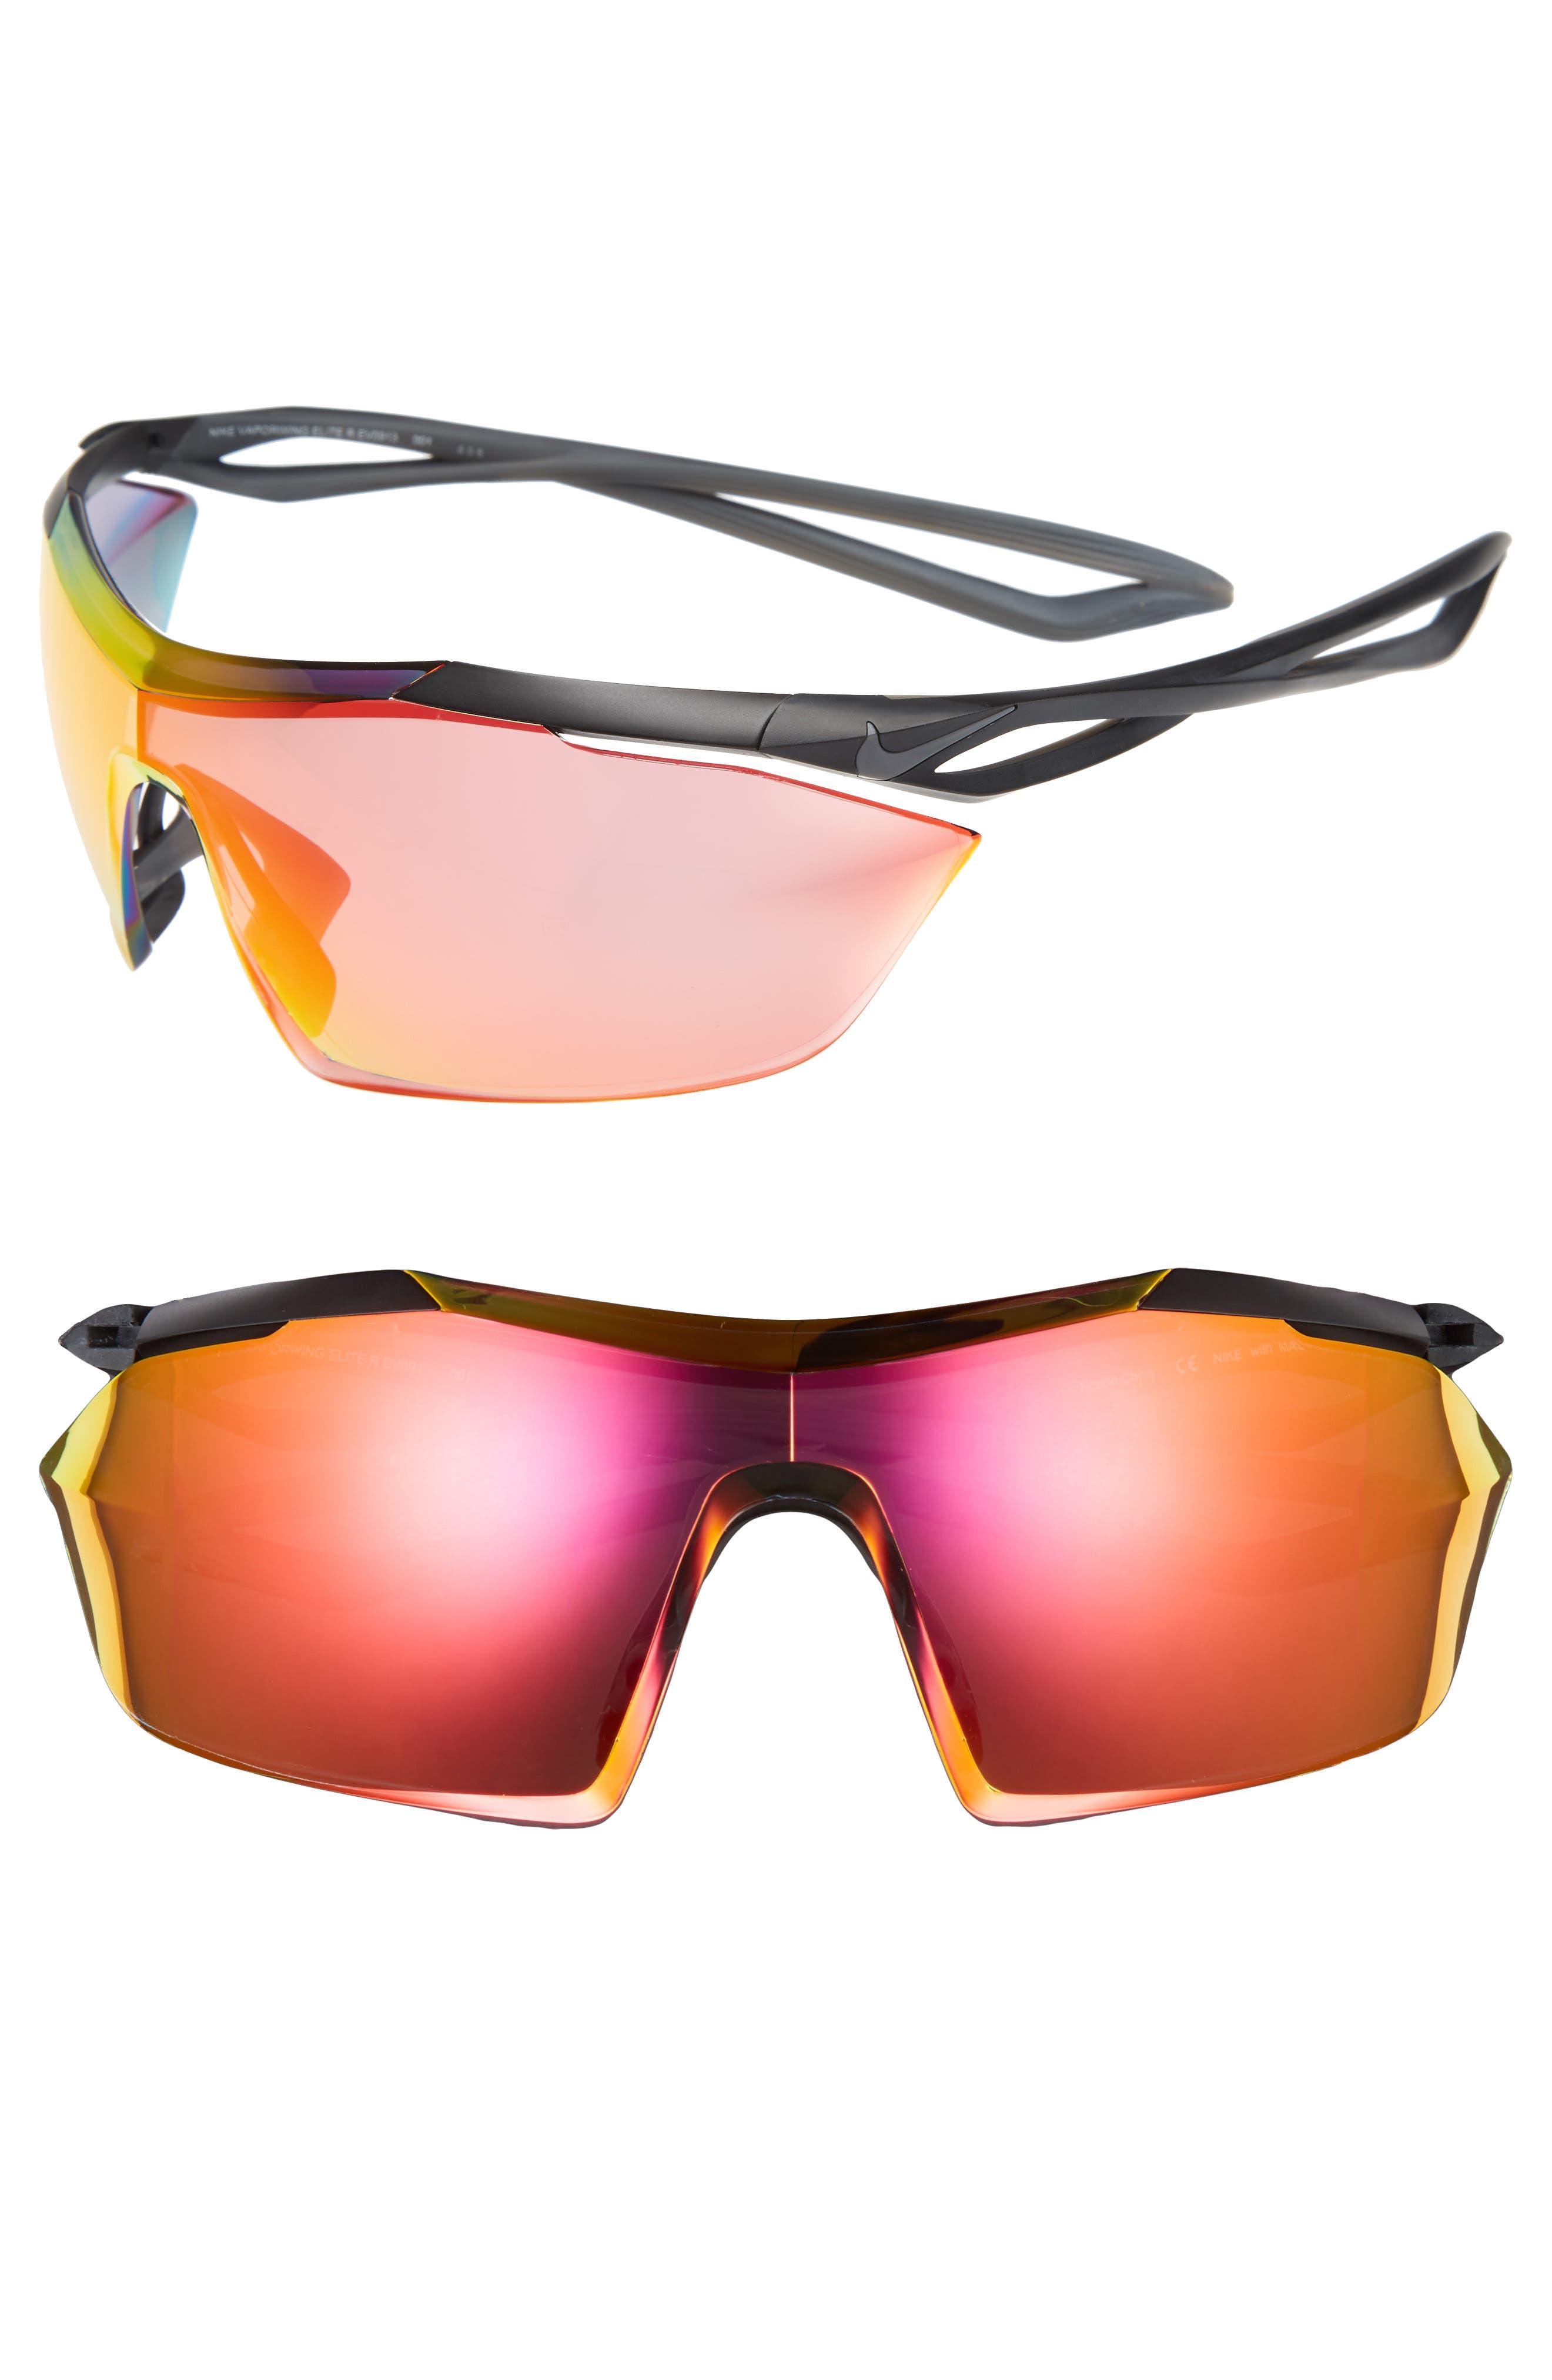 Vaporwing Elite 90mm Running Sunglasses,                             Main thumbnail 1, color,                             001